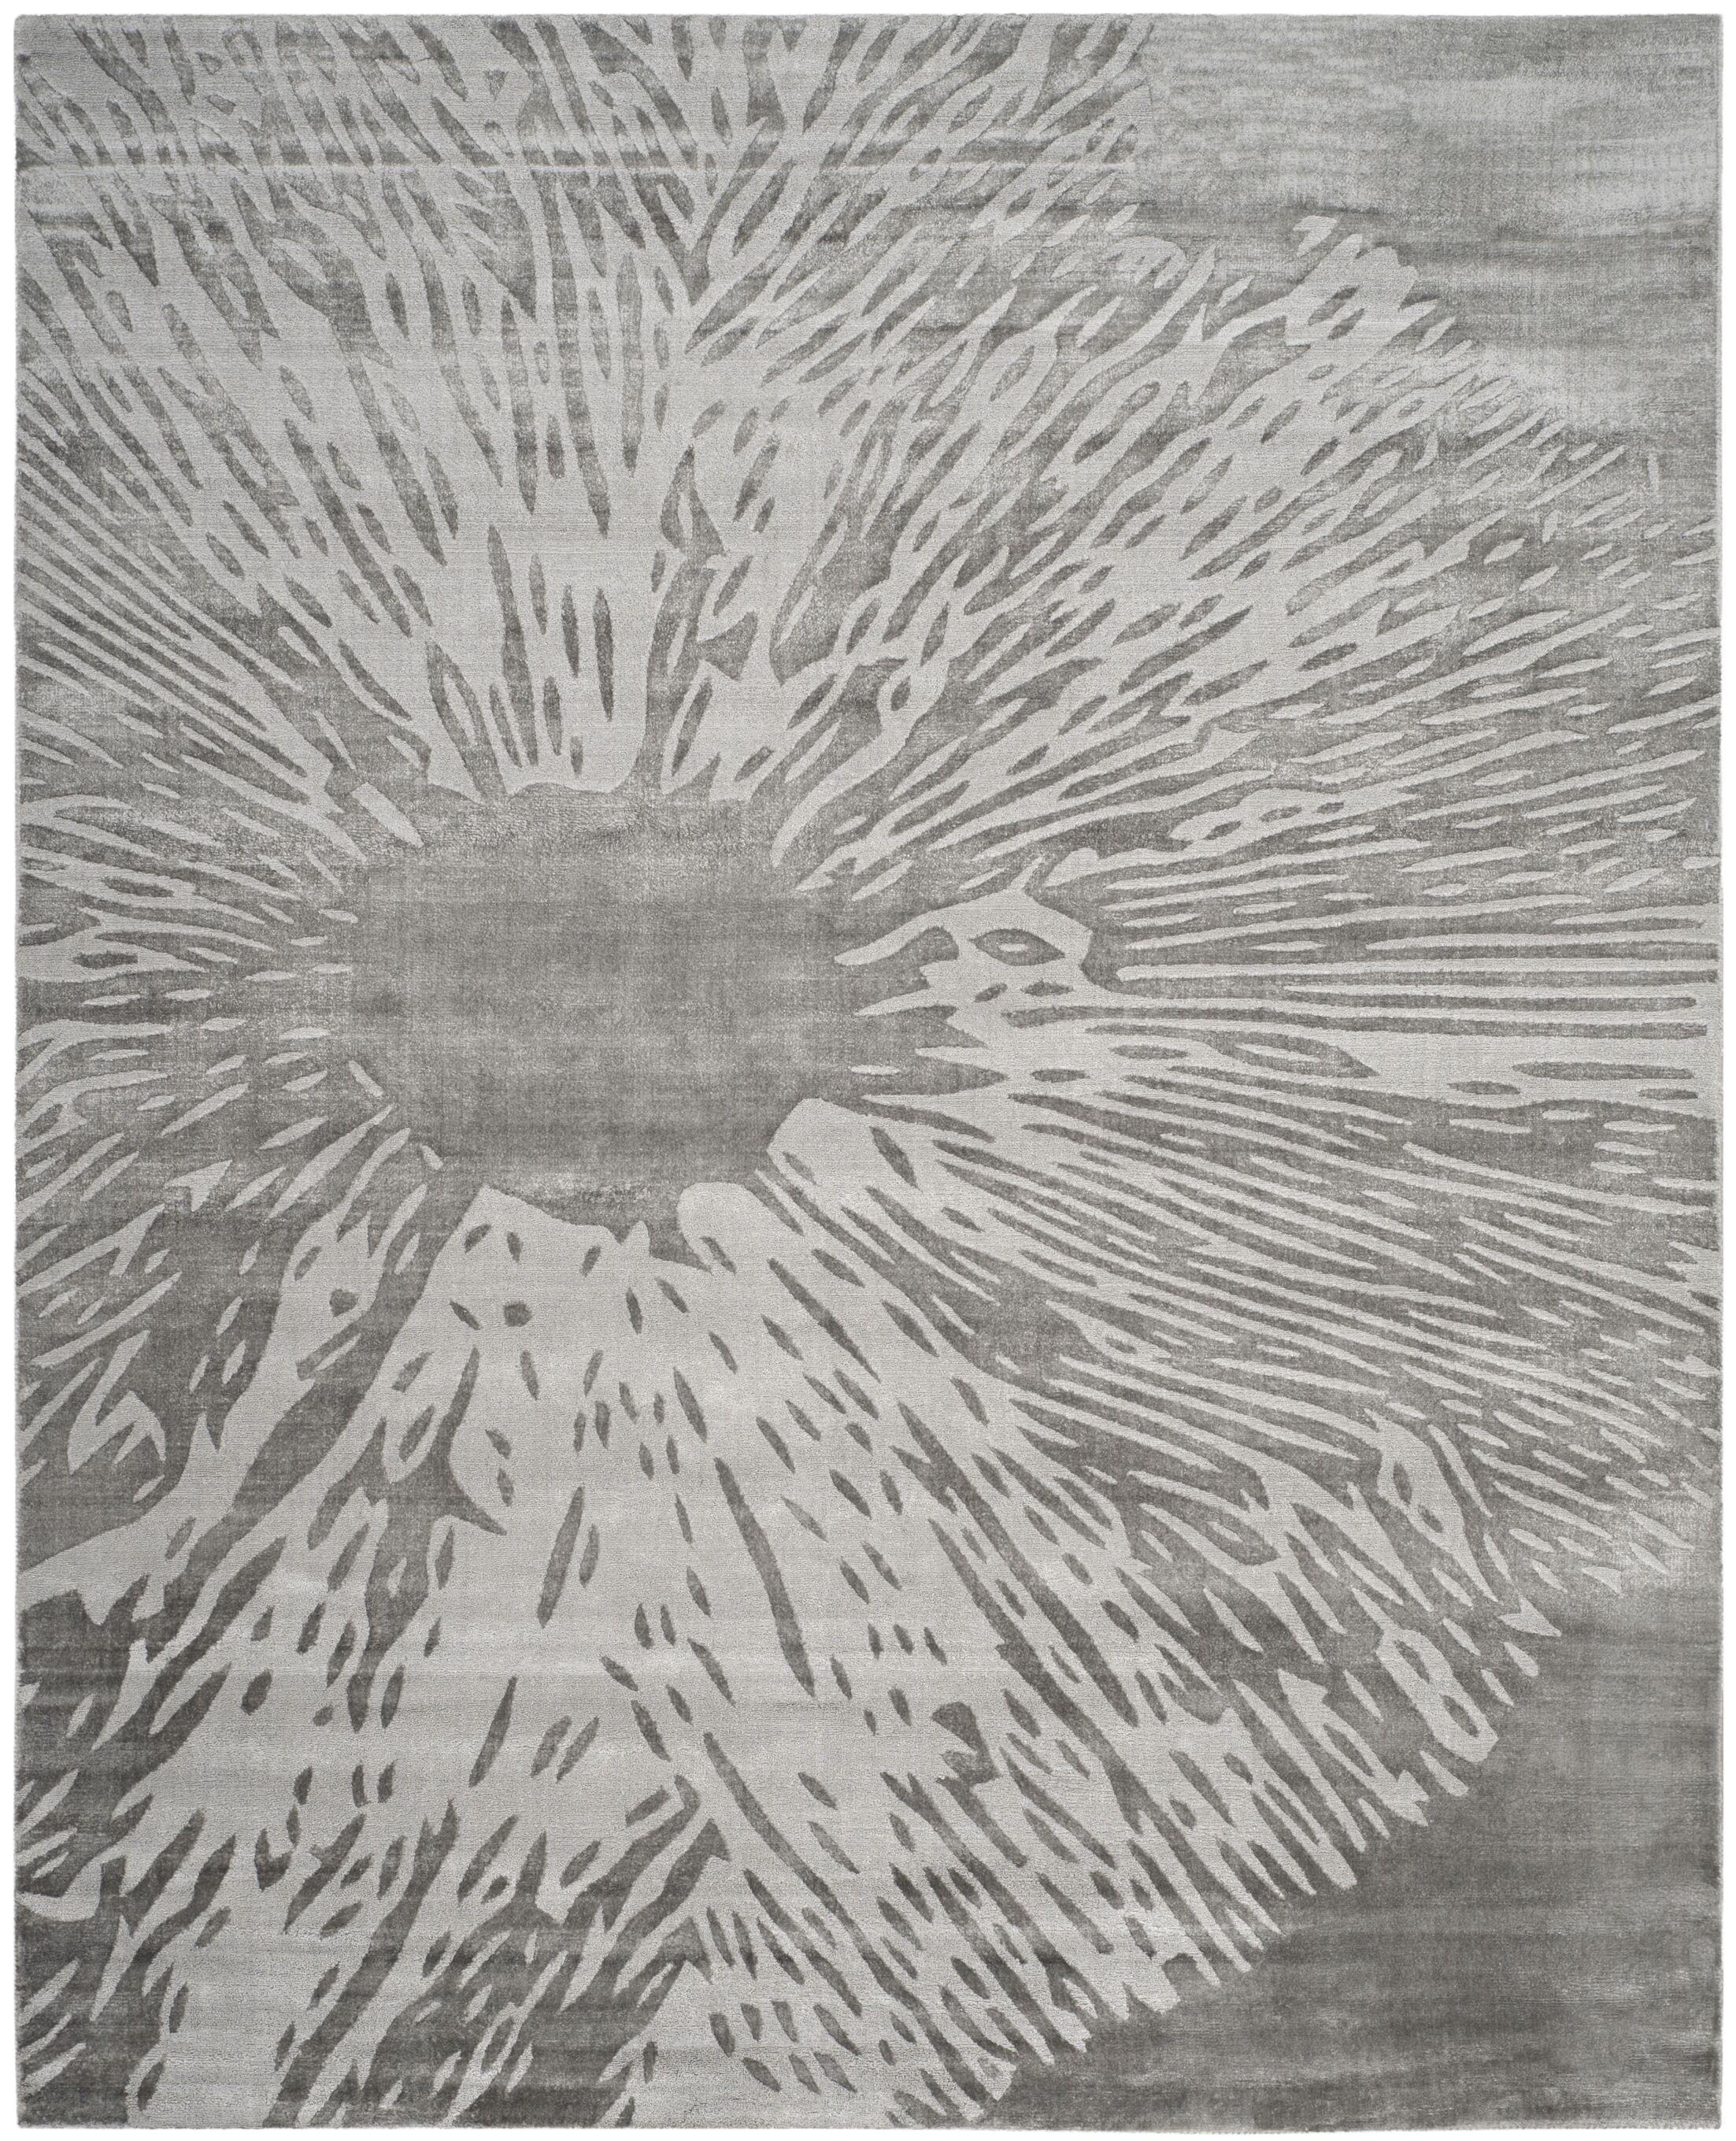 Moorhouse Hand-Woven Gray Area Rug Rug Size: Rectangle 8' x 10'